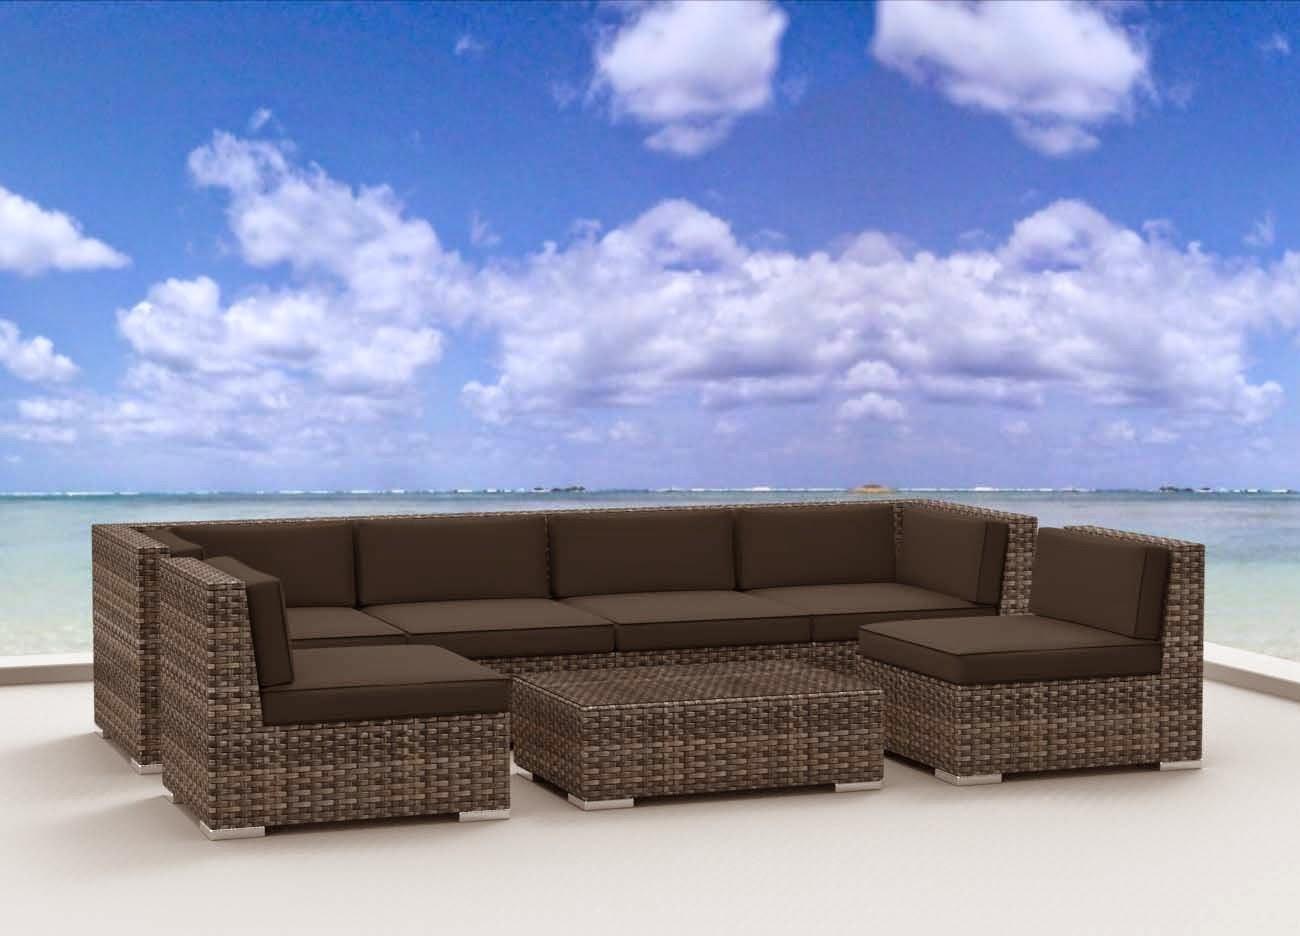 Urban Furnishing Modern Outdoor Backyard Wicker Rattan Patio Furniture Sofa Sectional Couch Set